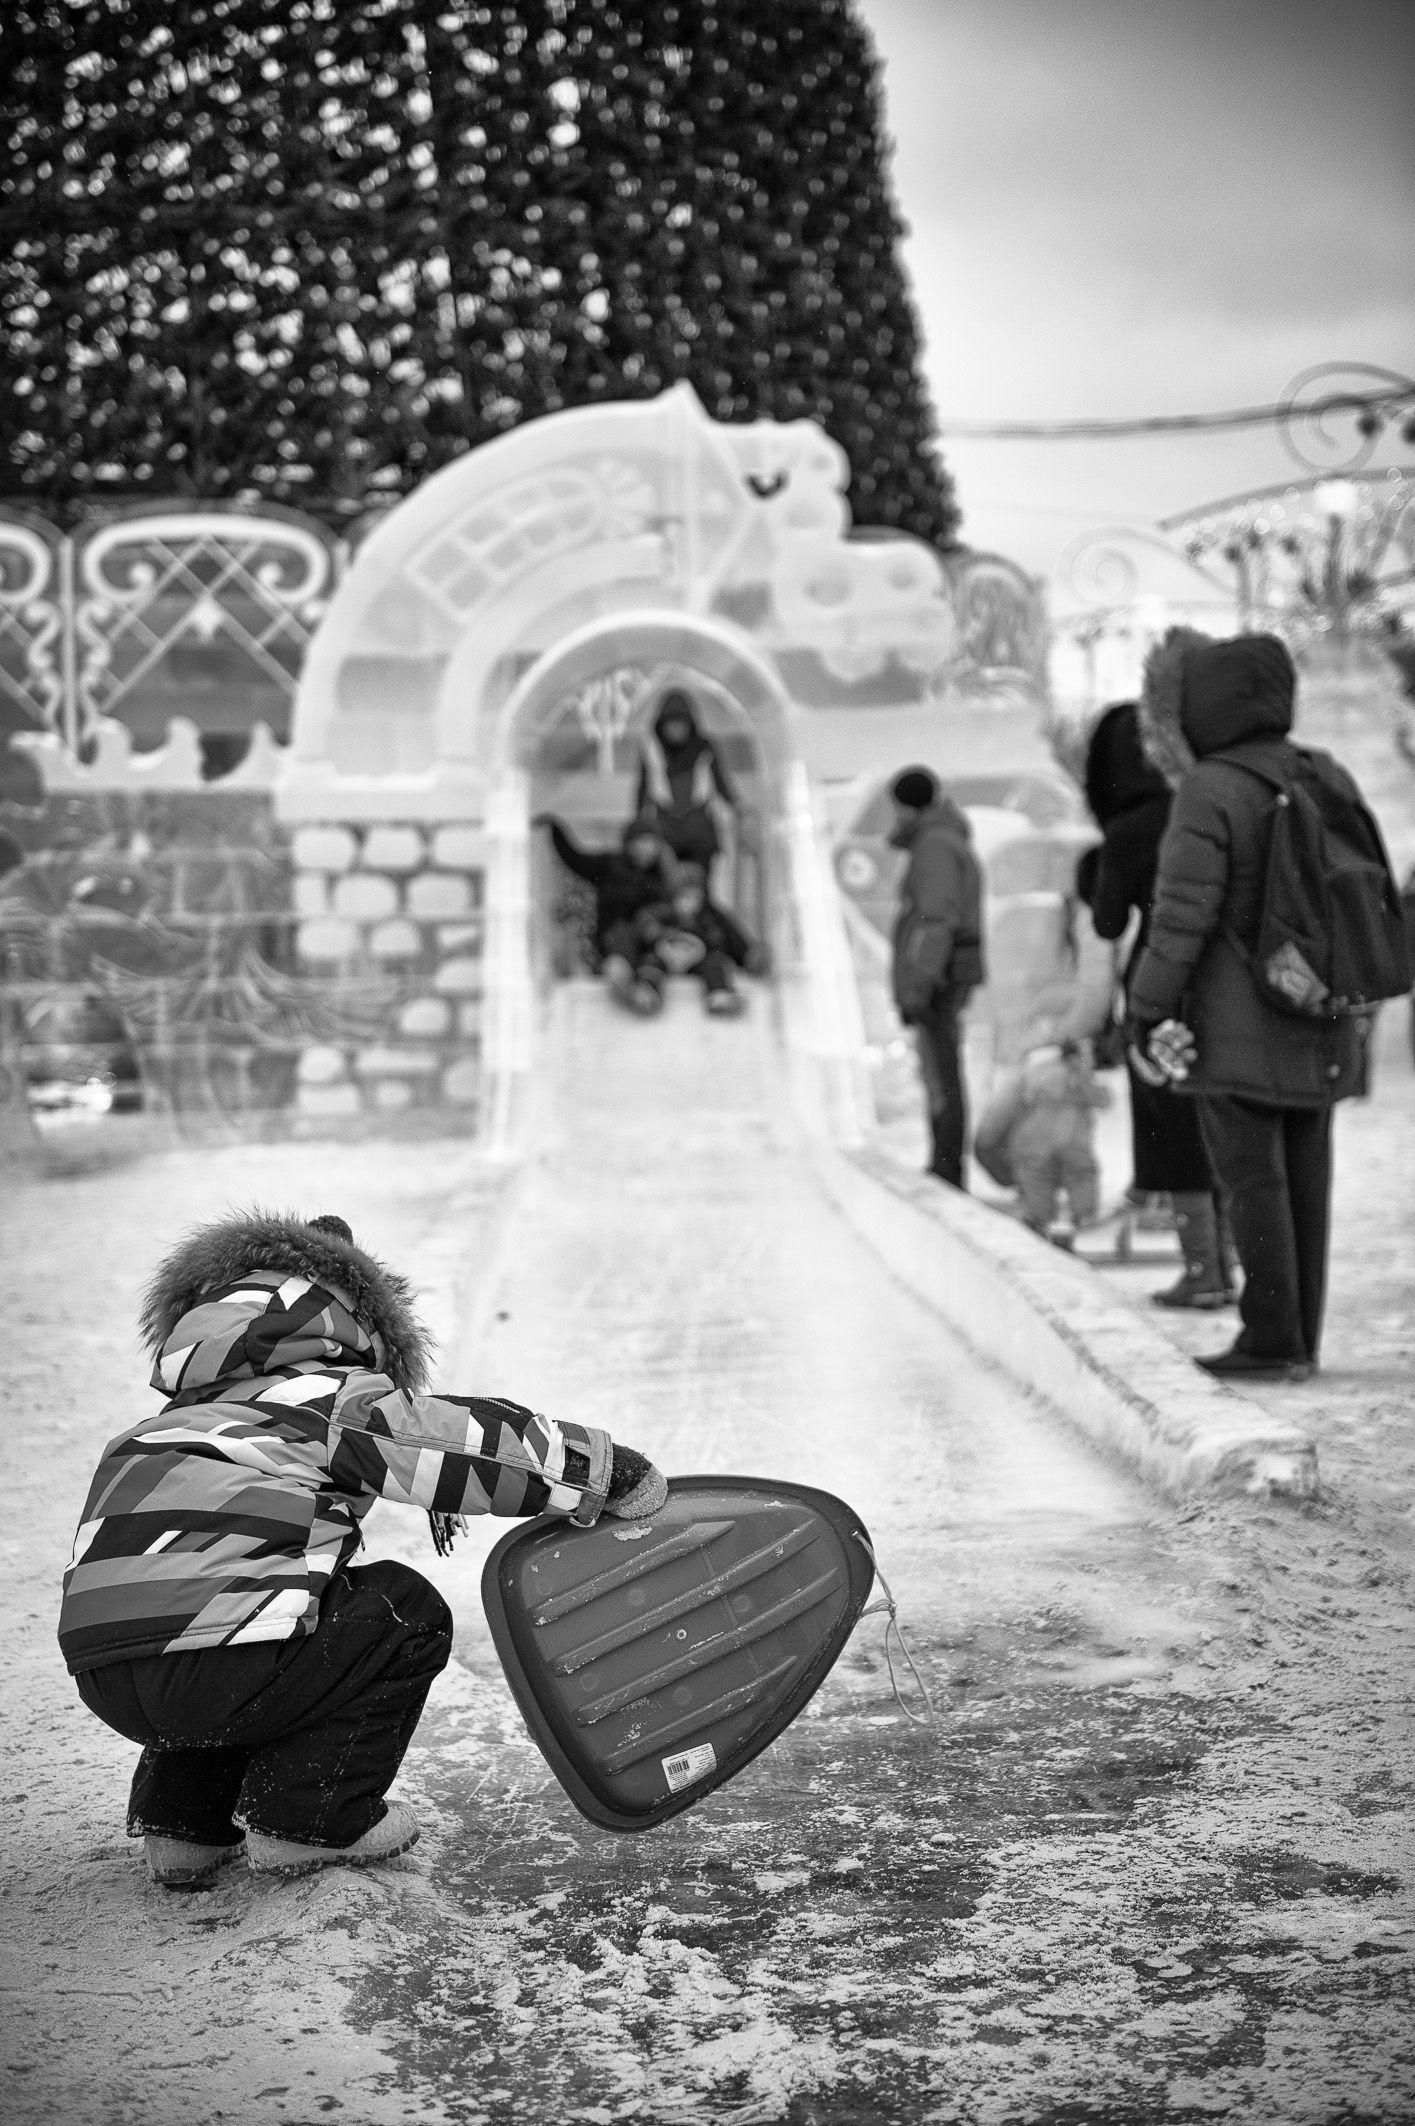 Photographer Андреа Сивилотти (Andrea Sivilotti) - Games on the ice in Yekaterinburg